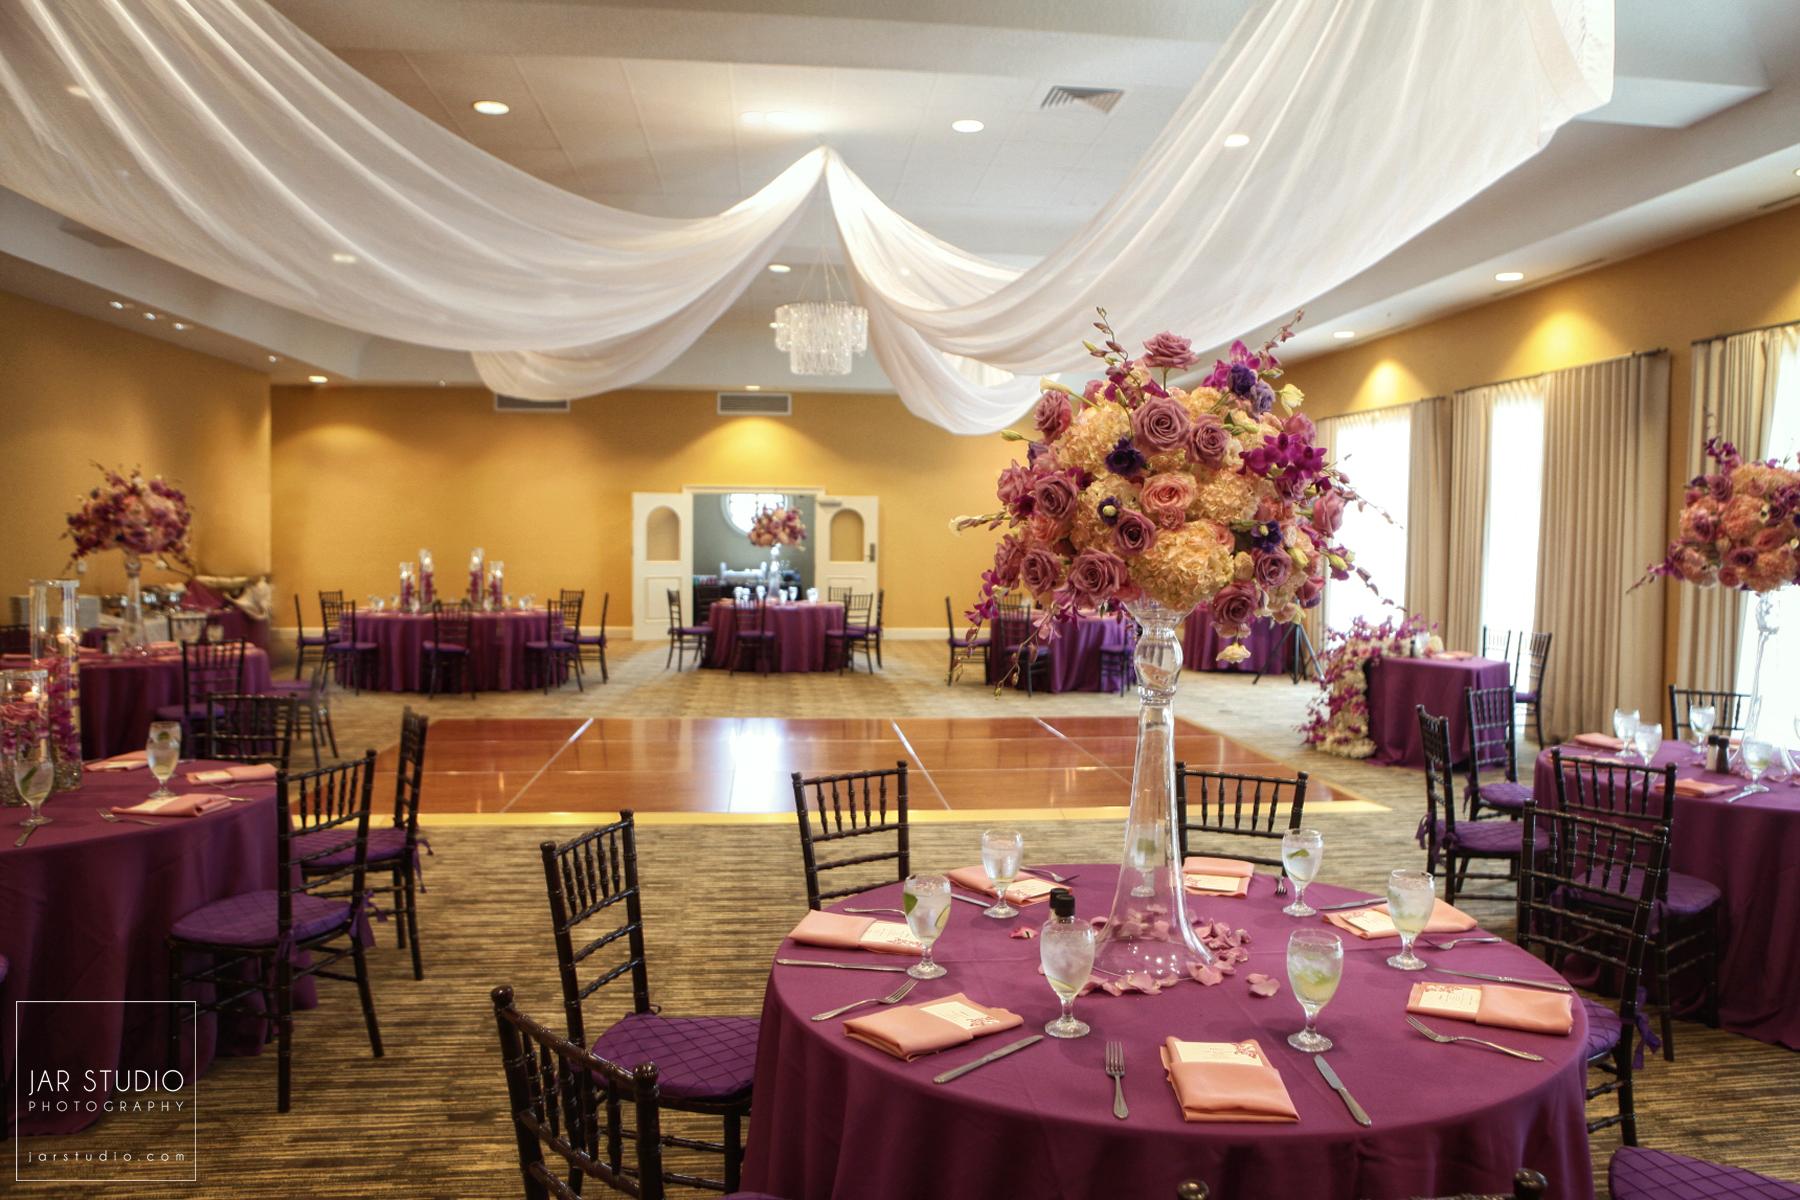 29-Hilton-Grand-Tuscany-event-venue-wedding-reception-jarstudio-photographer.JPG